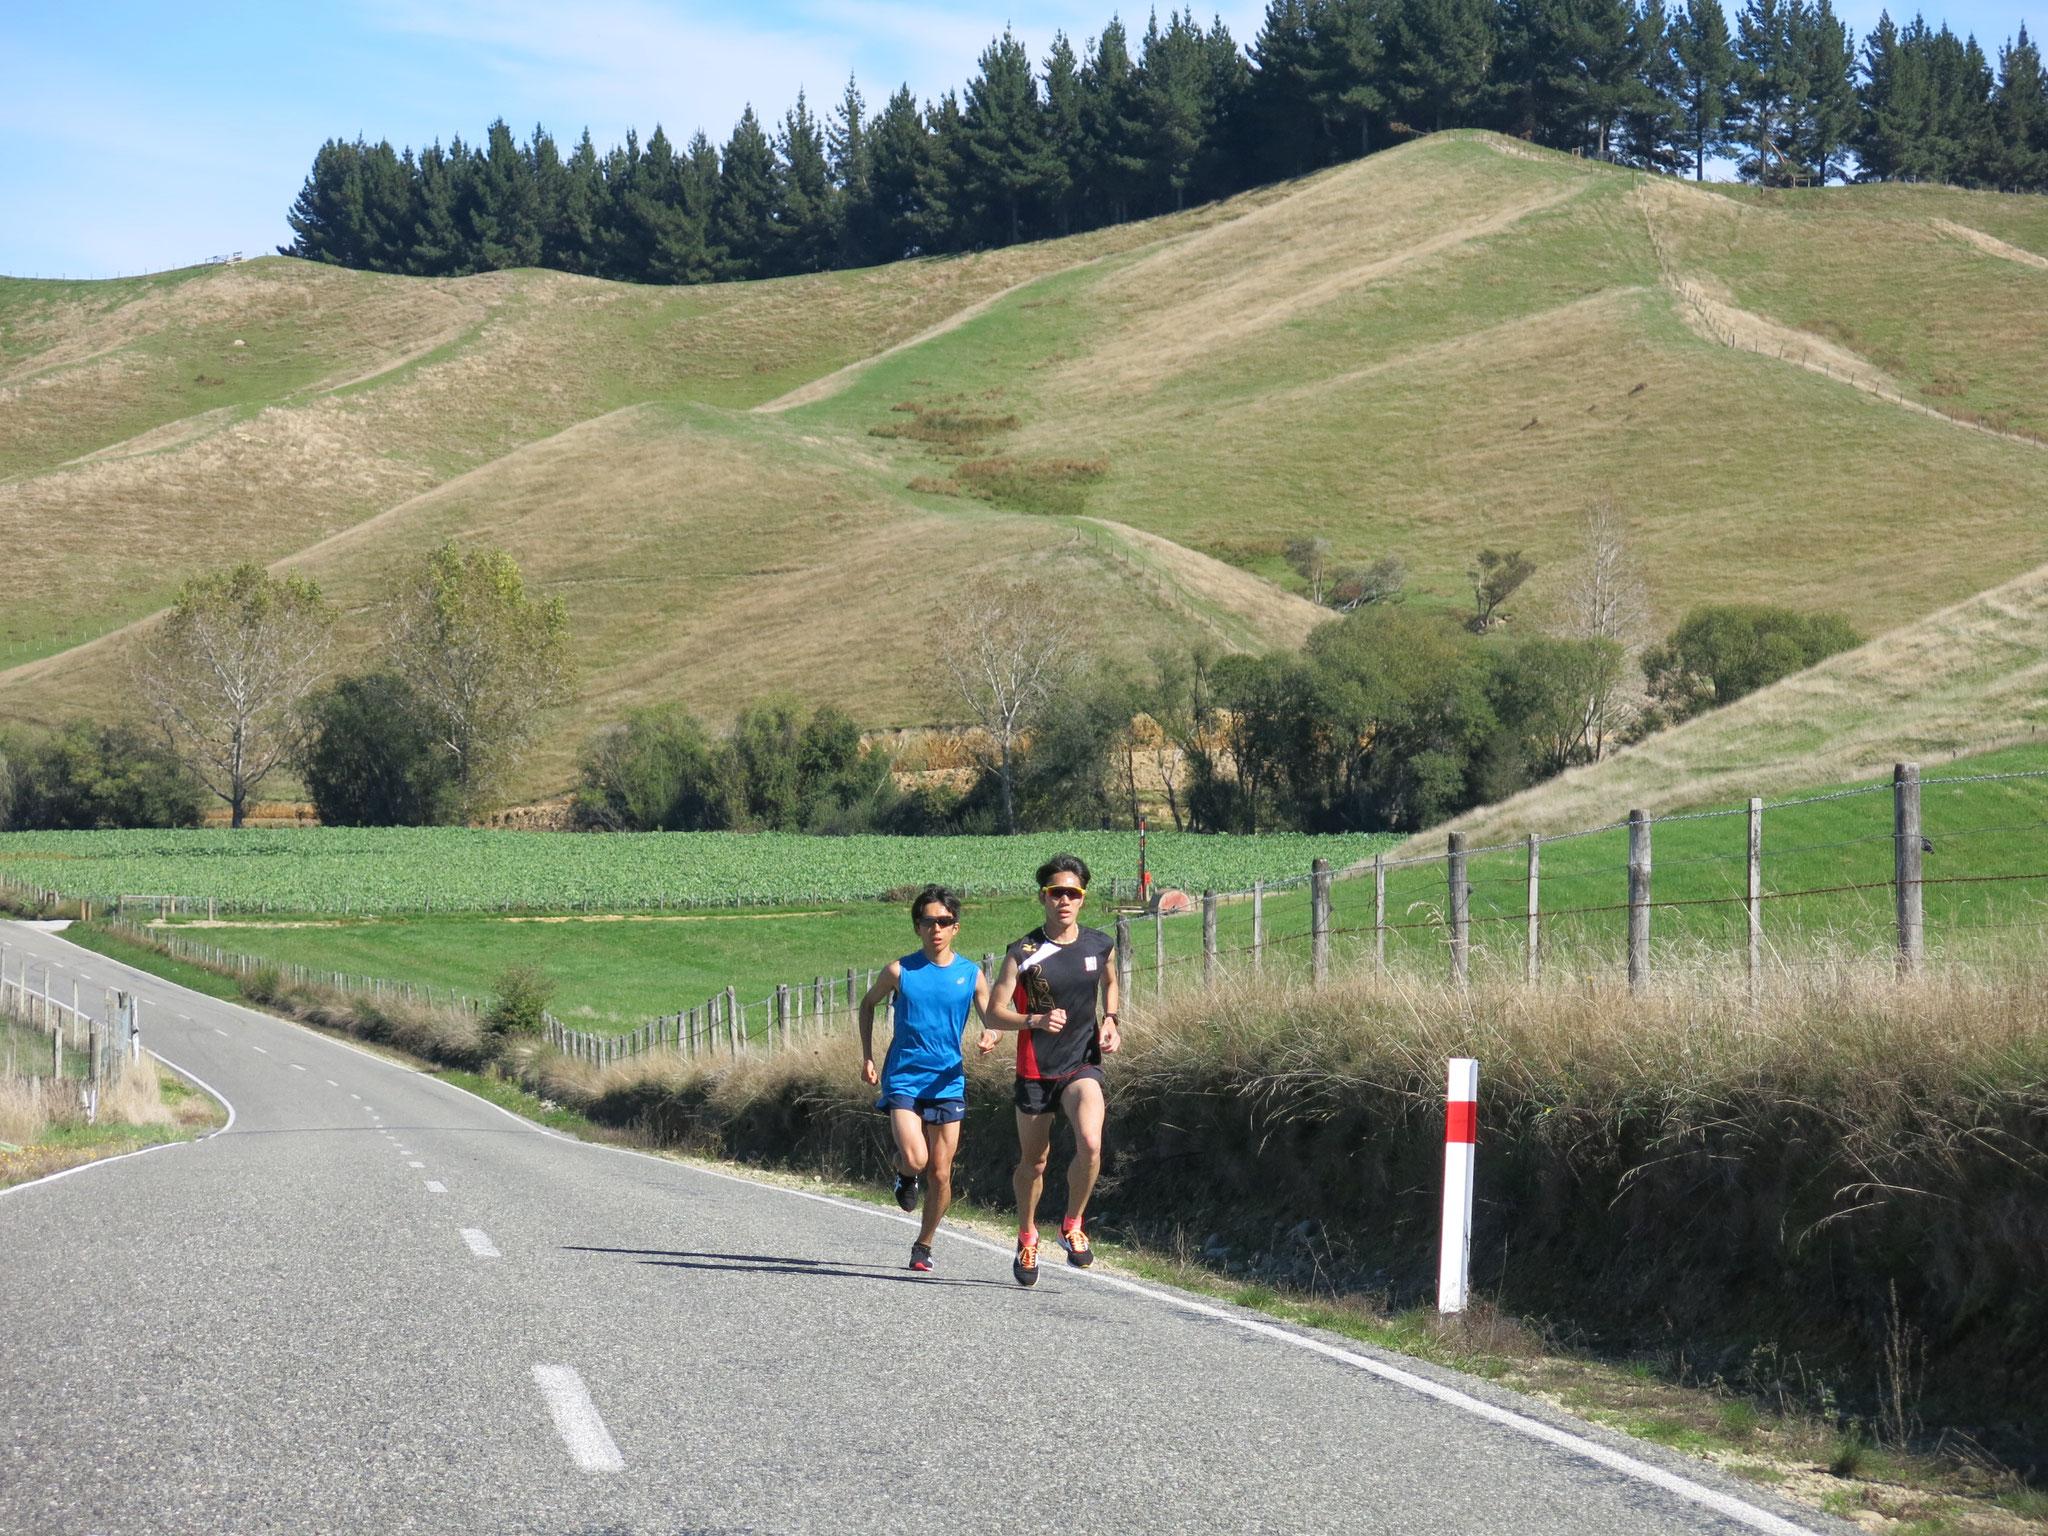 Upper Moutere / アップダウンのある40 km~50kmの長距離走コース